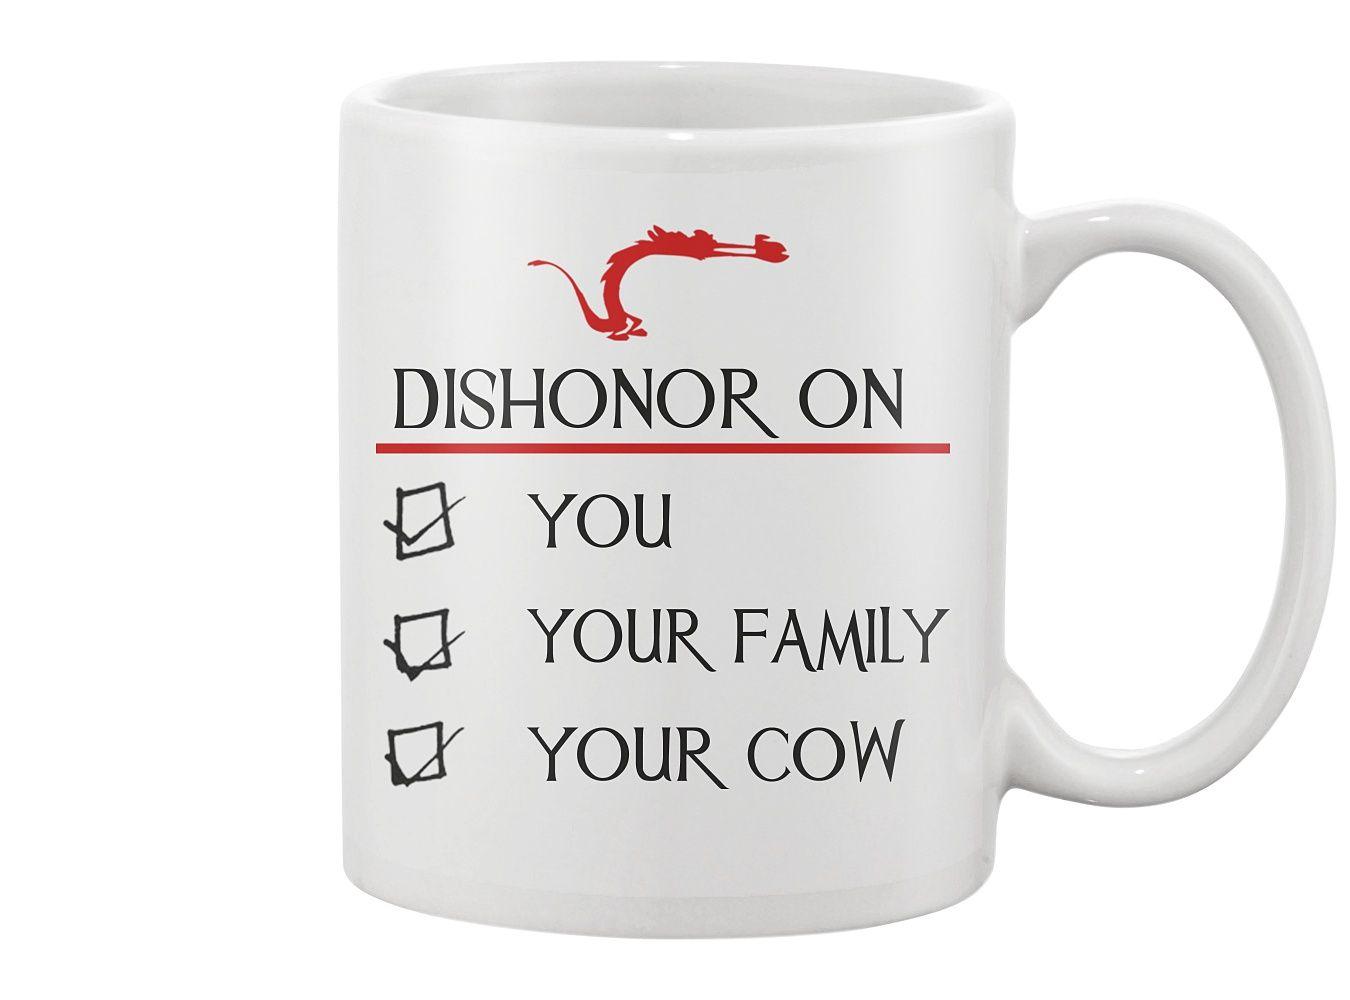 Dishonor On You Your Family Cow Coffee Mug Tea Cup White 11oz and 15oz Ceramic